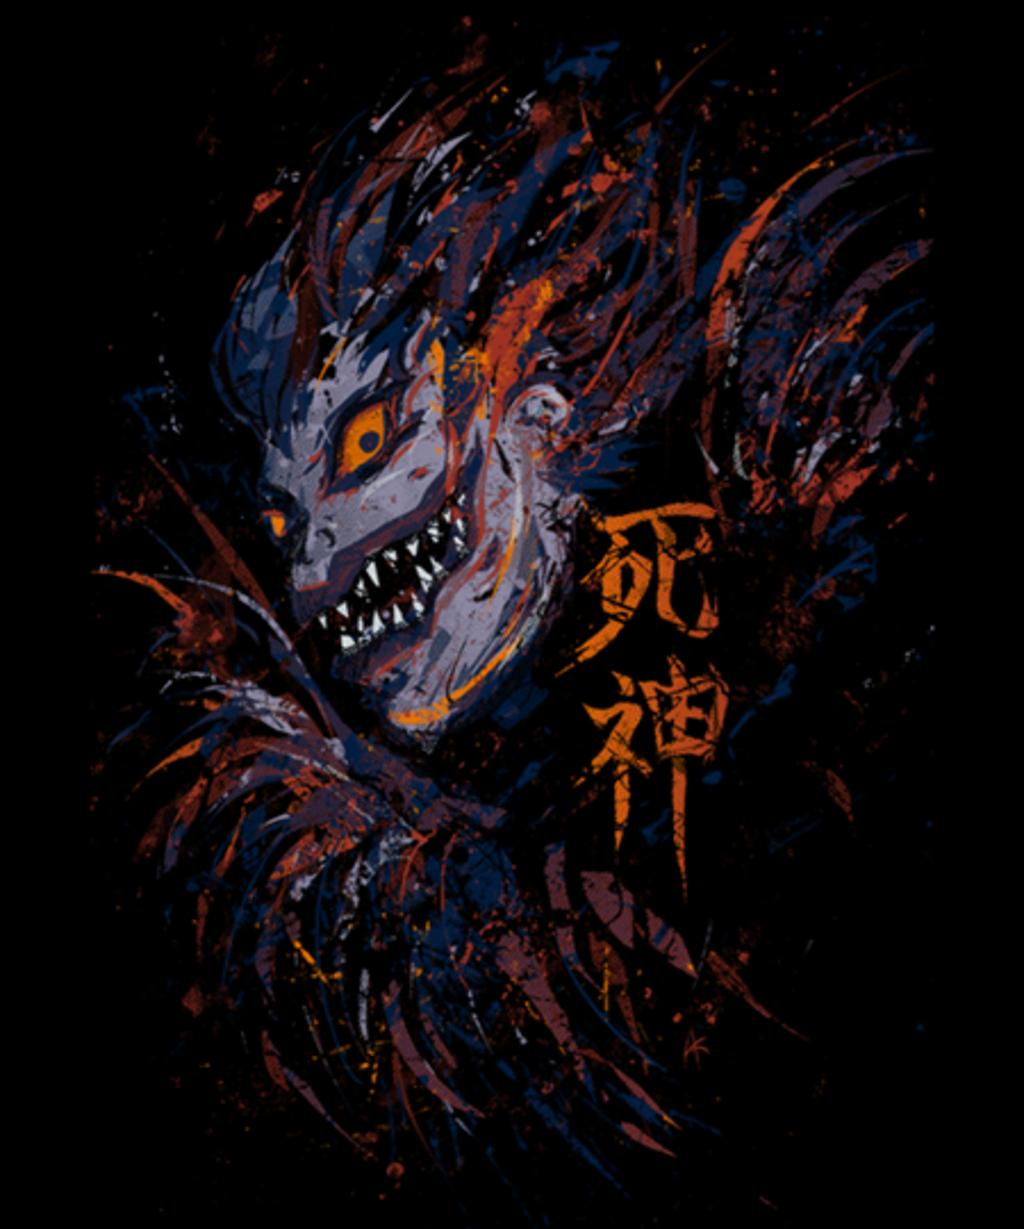 Qwertee: Shinigami